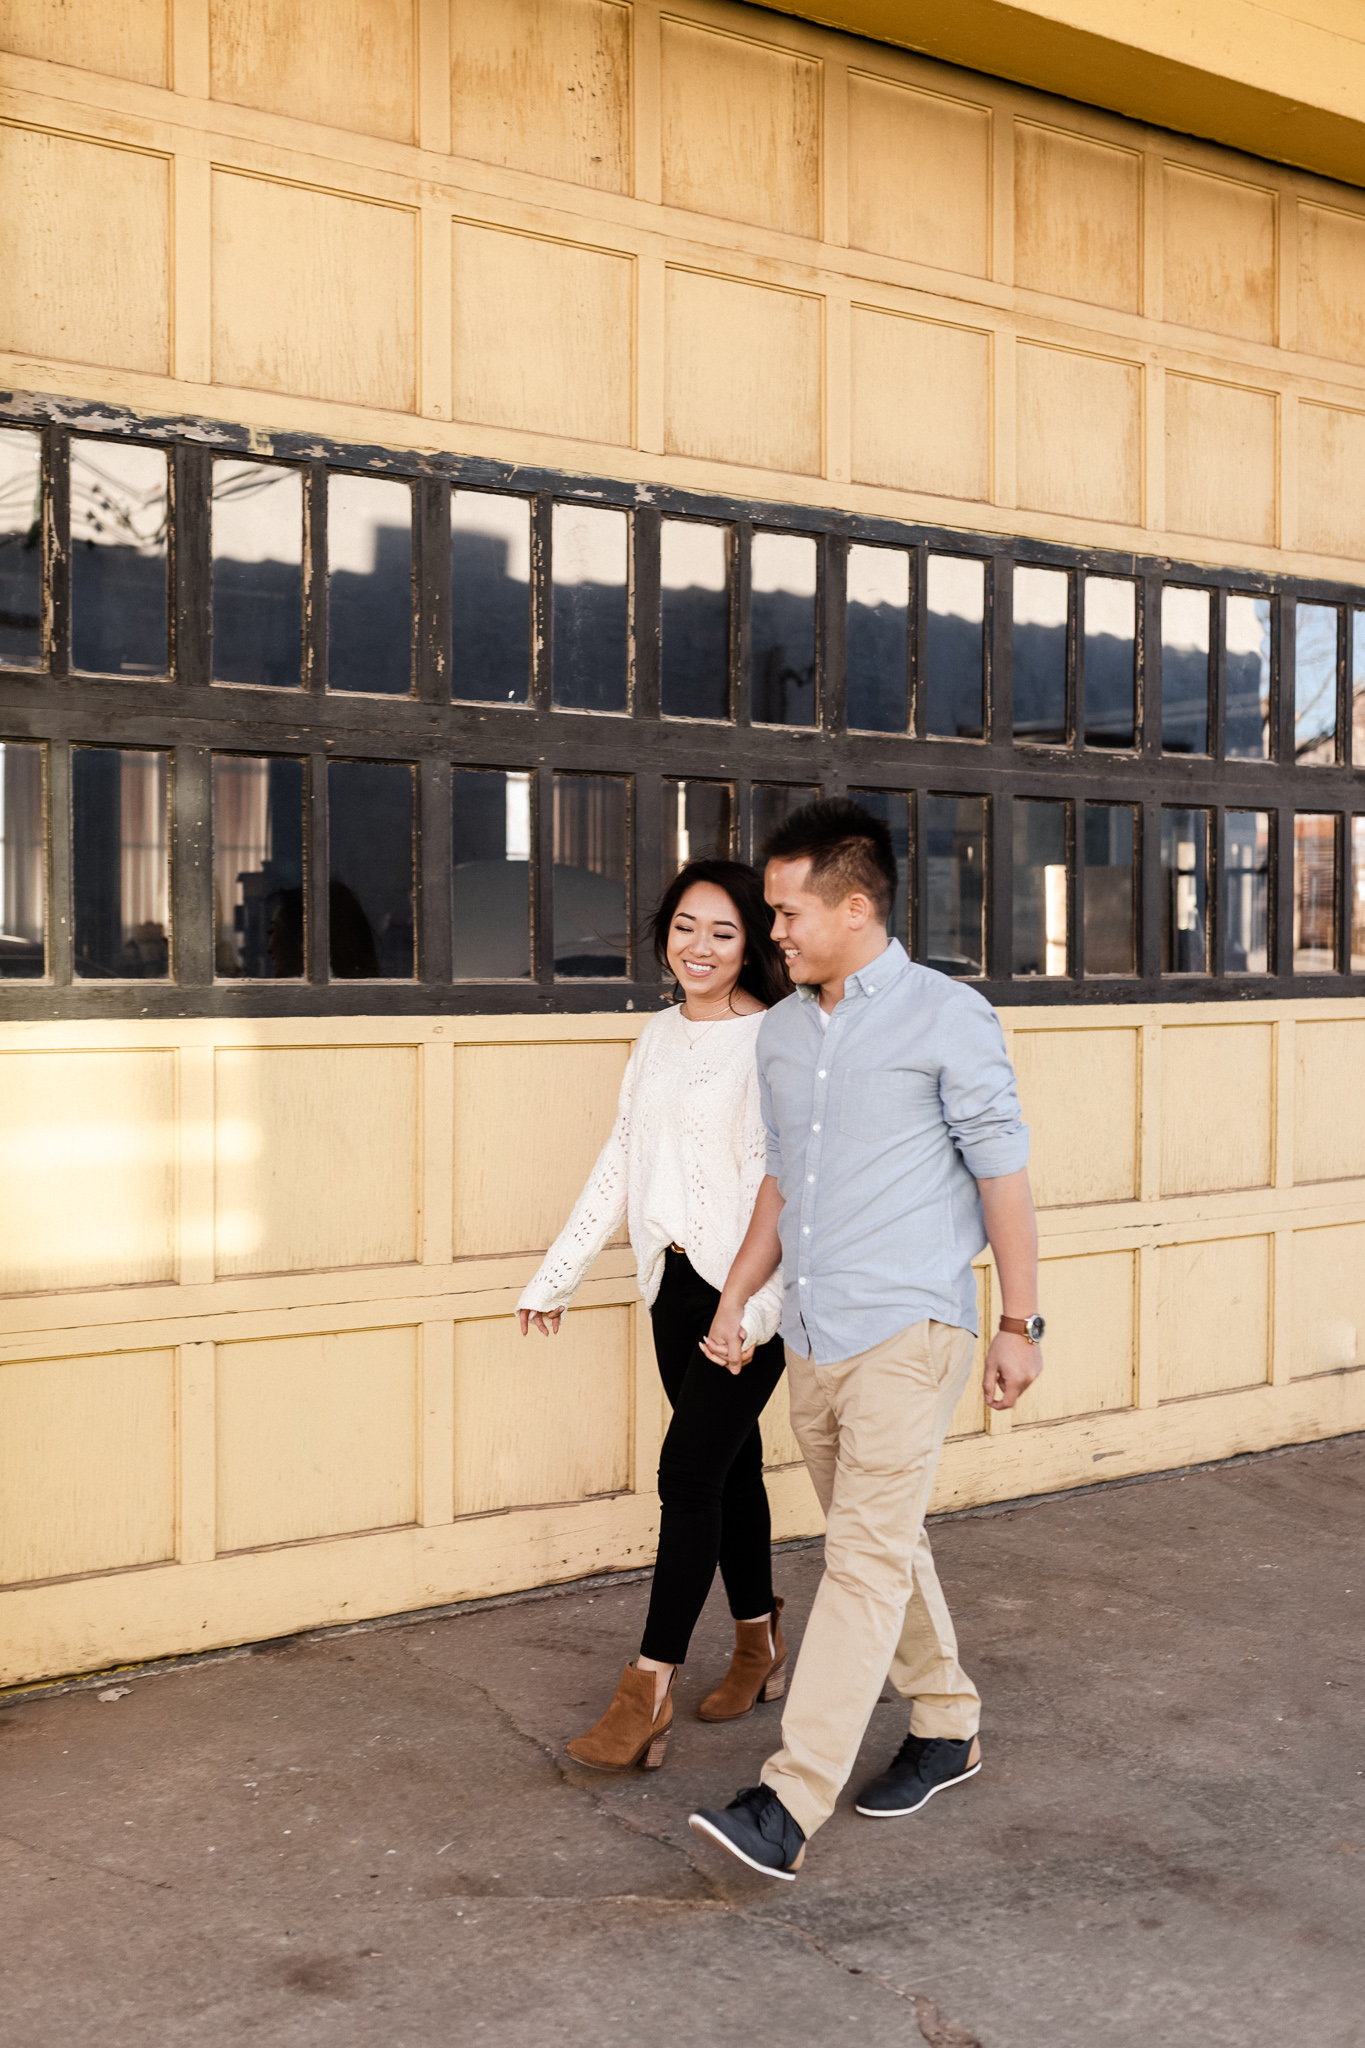 Hieu + Teresa | Colorful Romantic Downtown Engagements | Oklahoma Wedding Photographer-49.jpg